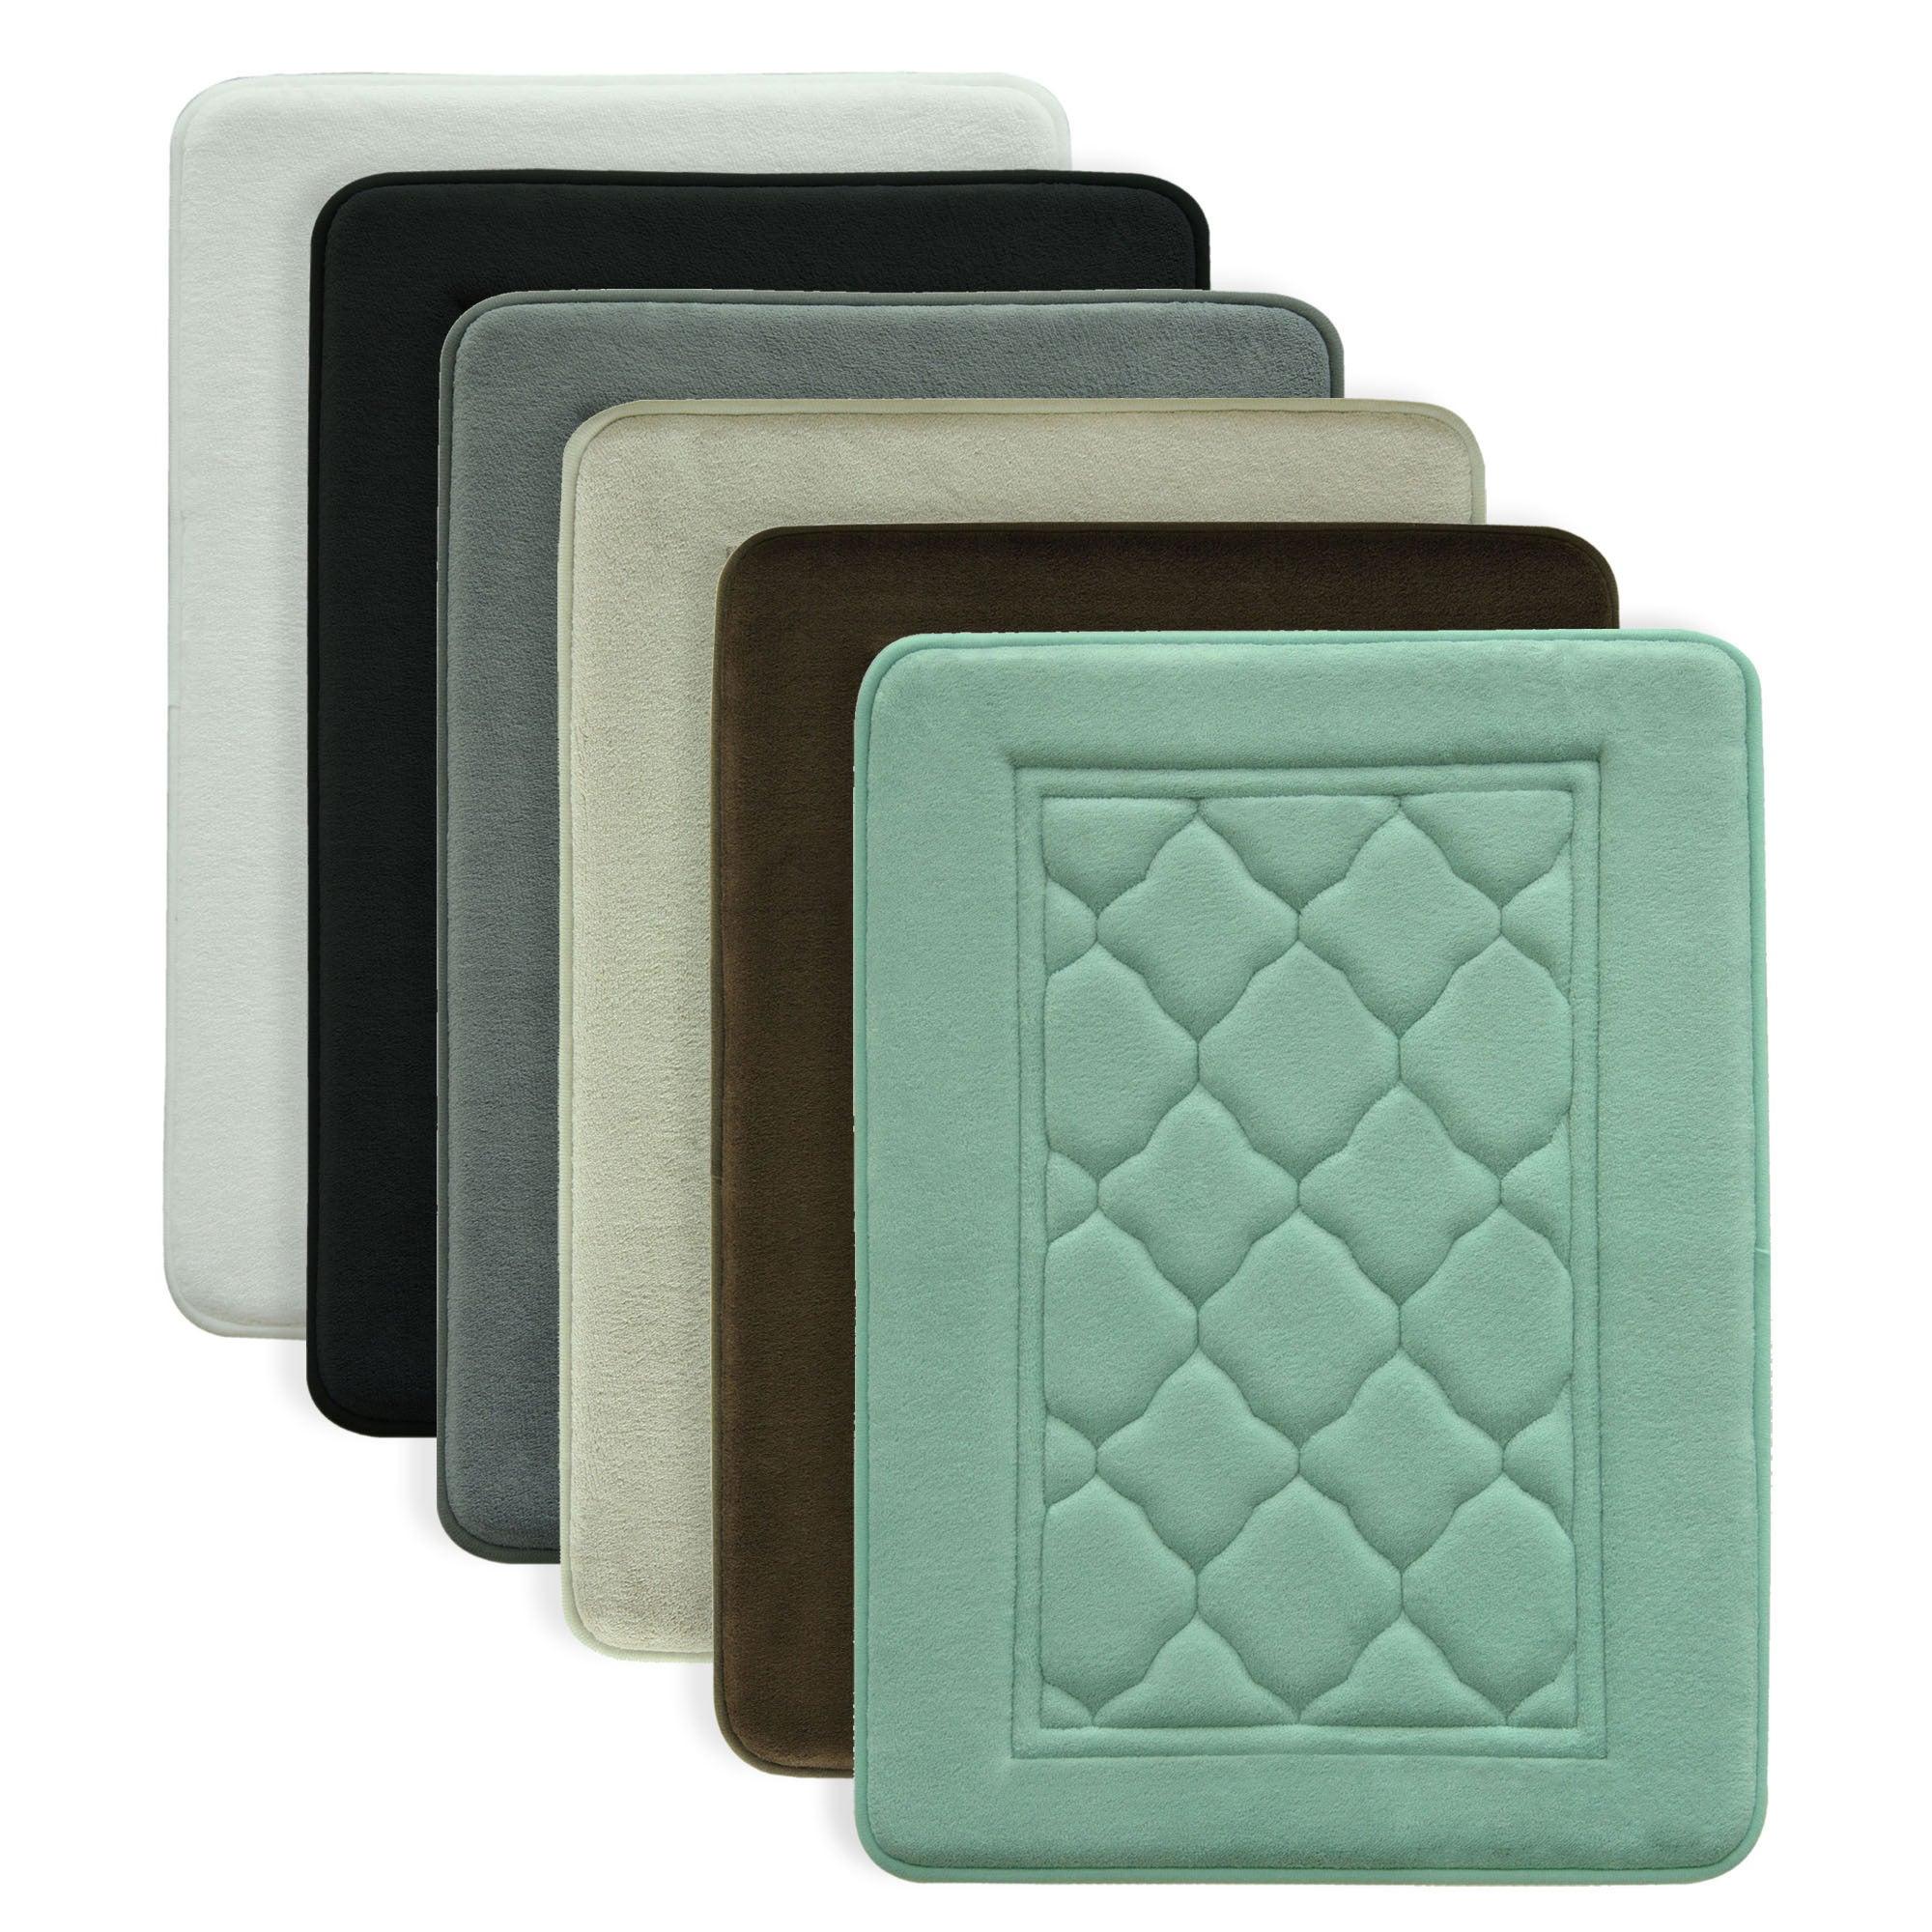 Microban Antimicrobial Memory Foam Bath Rug